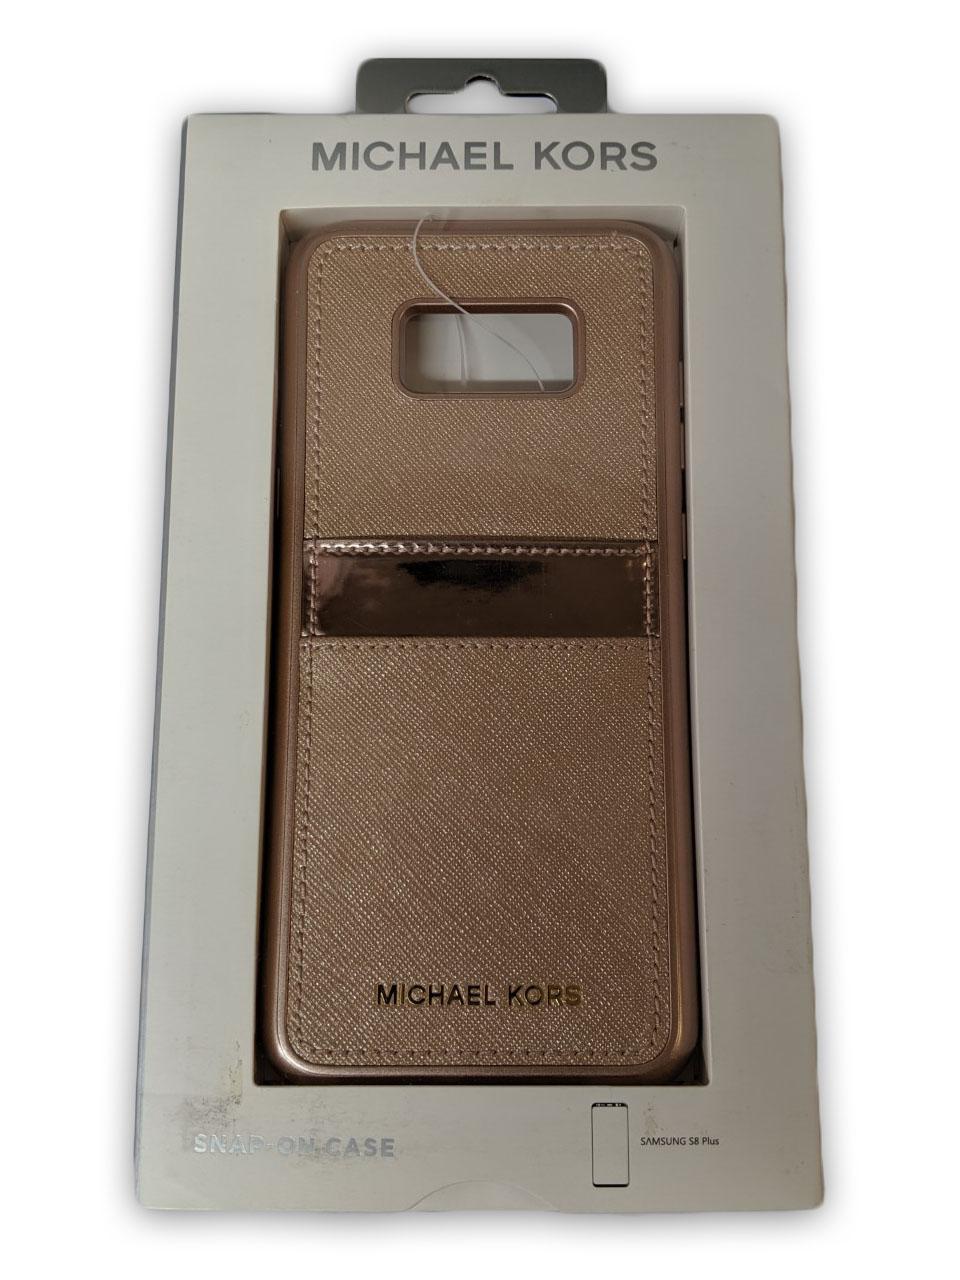 Original Michael Kors Saffiano Leather Case for Galaxy S8 Plus - Rose Gold